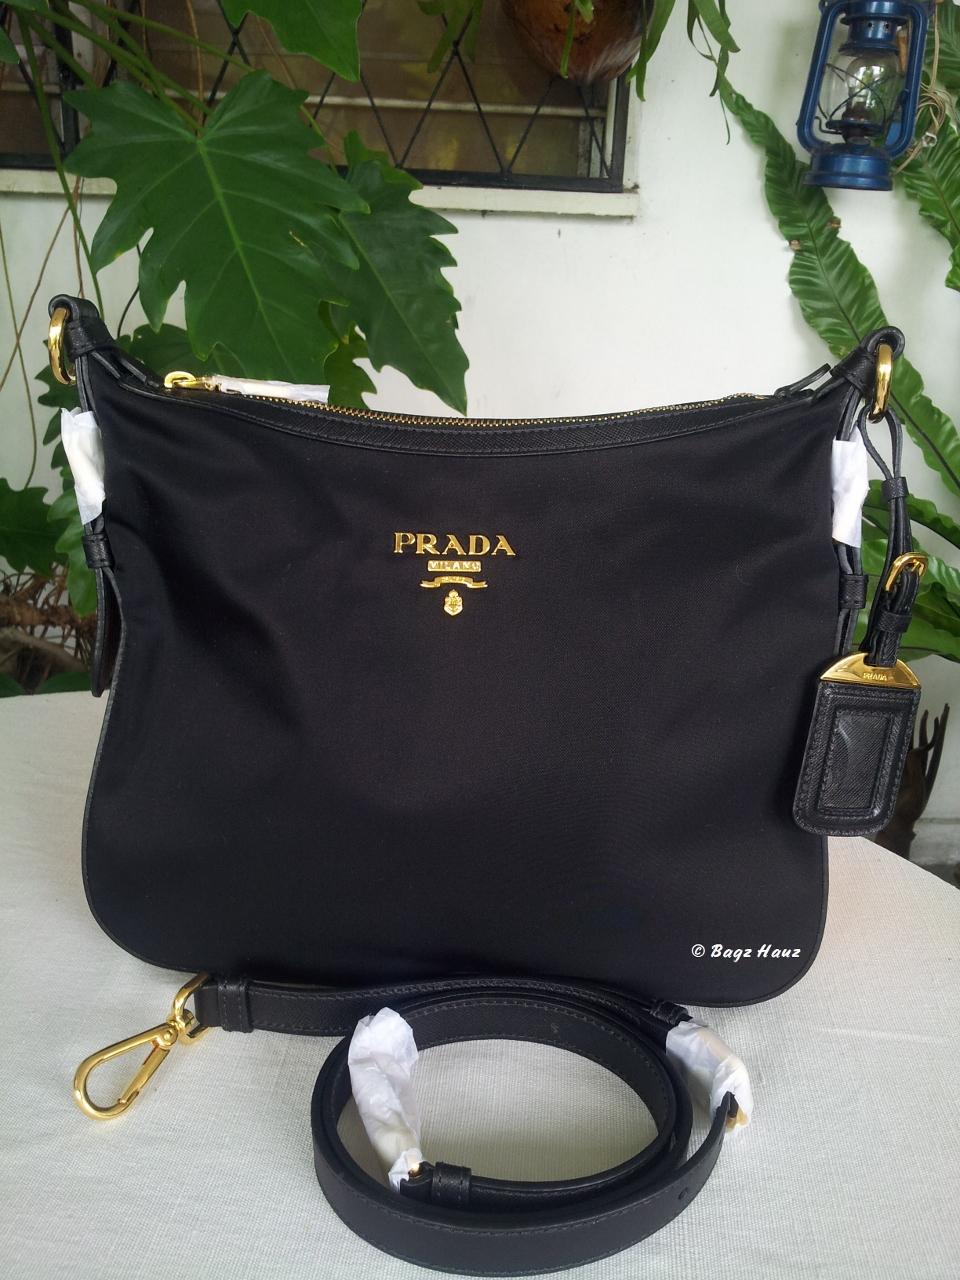 where can i buy prada wallet price malaysia 7f381 f44fb  spain prada bag  malaysia ed714 0a98d 87bb751e54